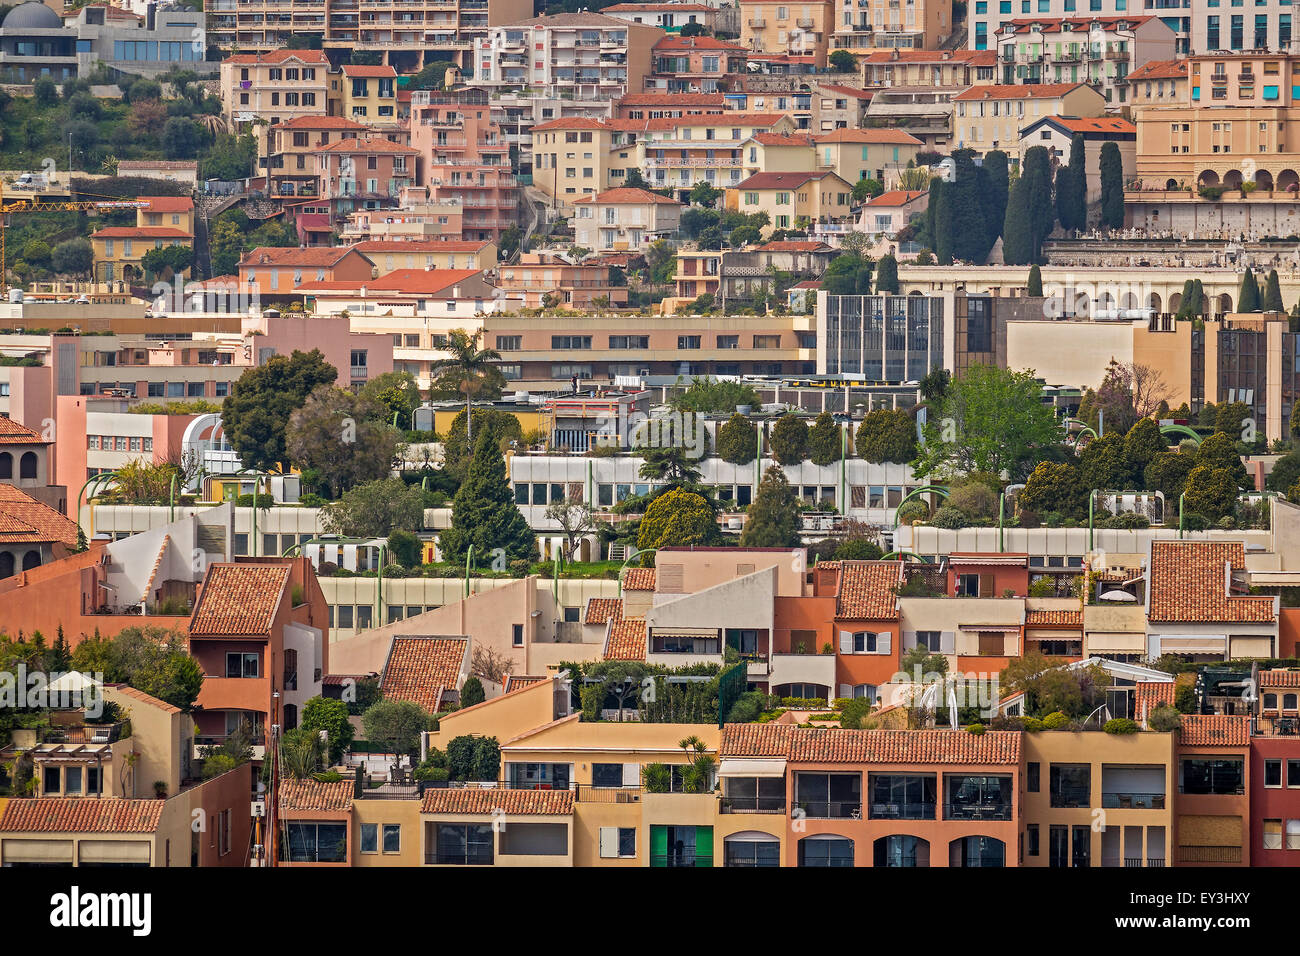 Very High density Housing Monte Carlo Monaco - Stock Image